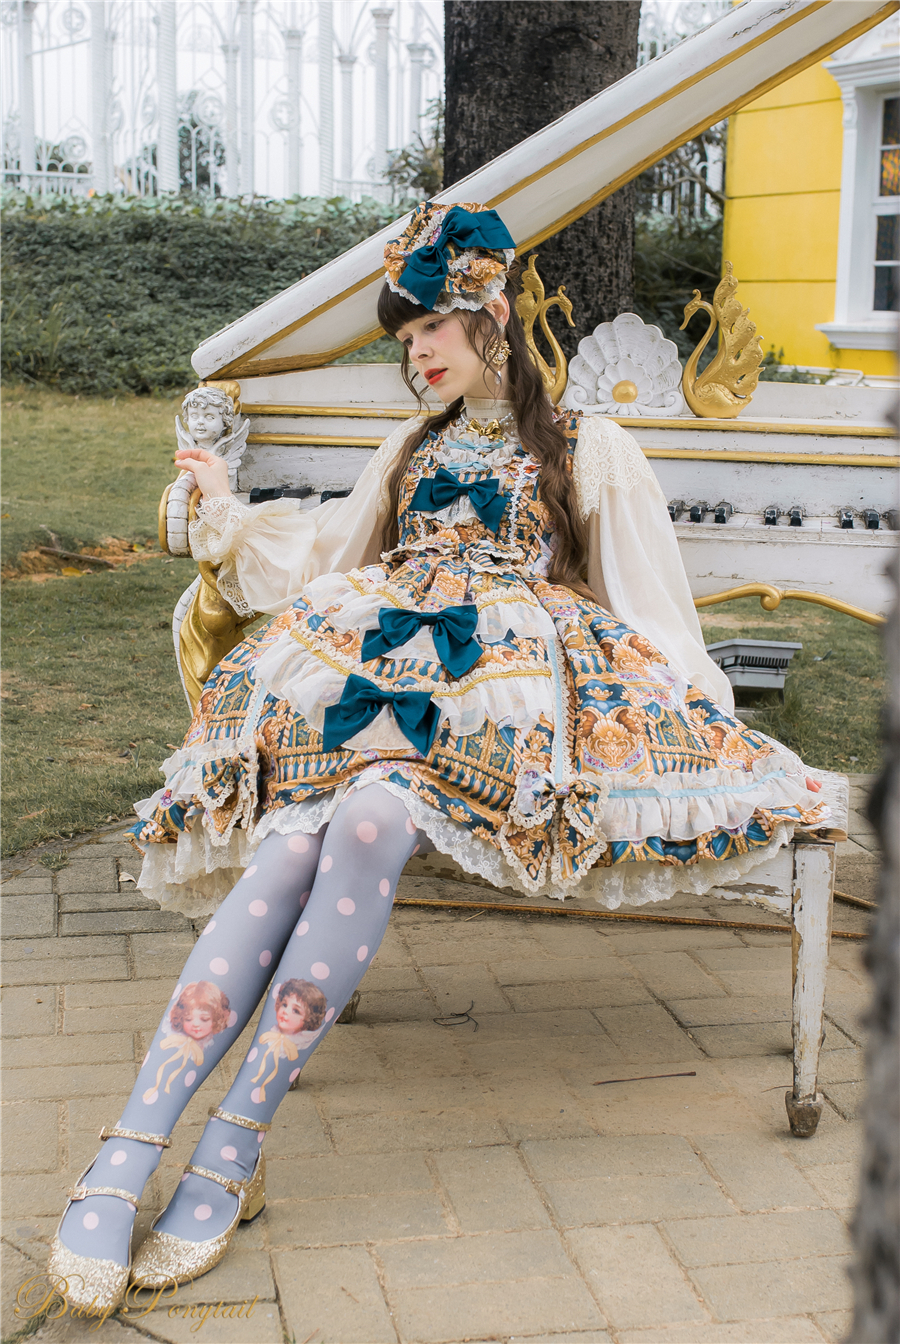 Babyponytail_Model_JSK_Tiel Present Angel_Claudia_2_10.jpg